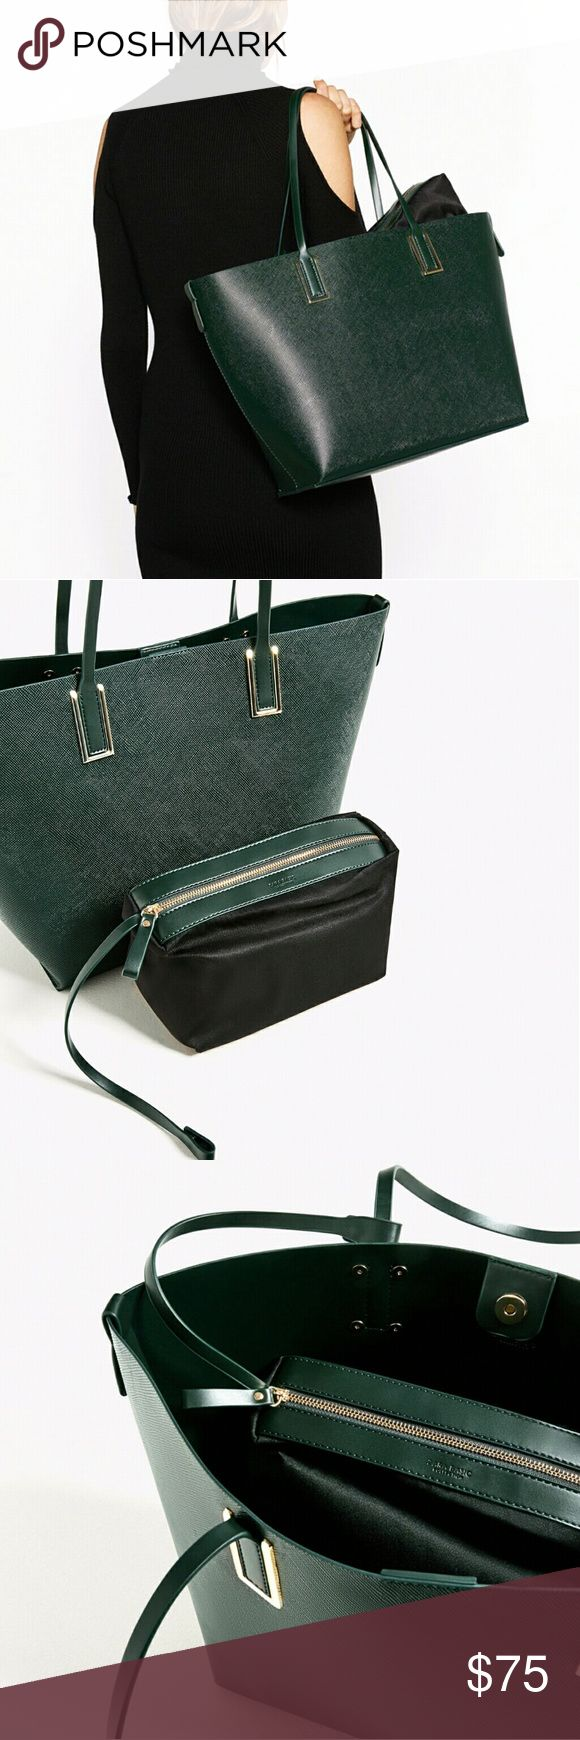 ZARA TOTE BAG BRAND NEW ZARA TOTE BAG BRAND NEW Zara Bags Totes